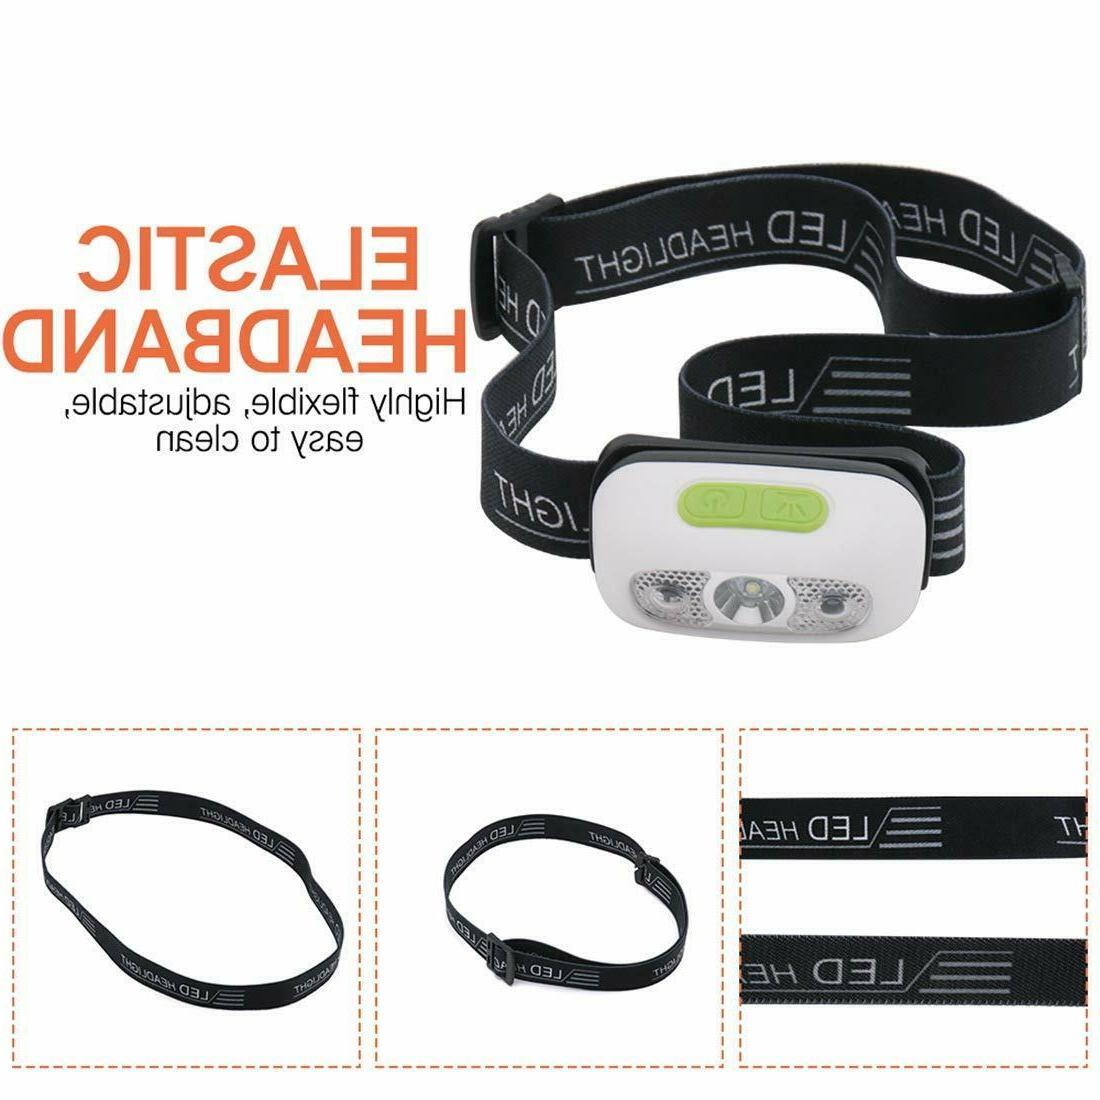 Waterproof USB Rechargeable Headlight Headlamp Torch